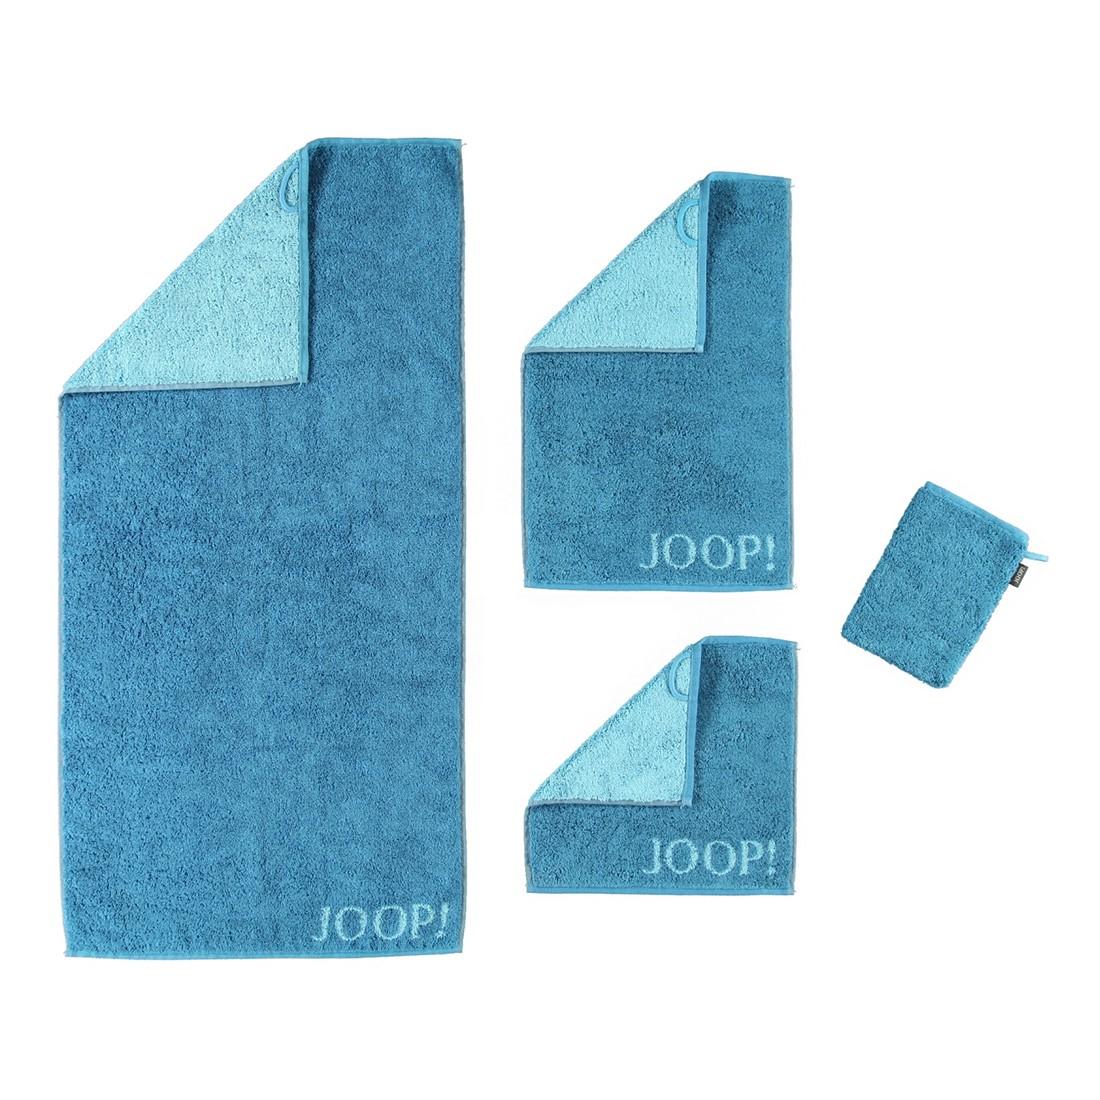 Handtuch Classic Doubleface – 100% Baumwolle Petrol – 44 – Seiflappen: 30 x 30 cm, Joop kaufen